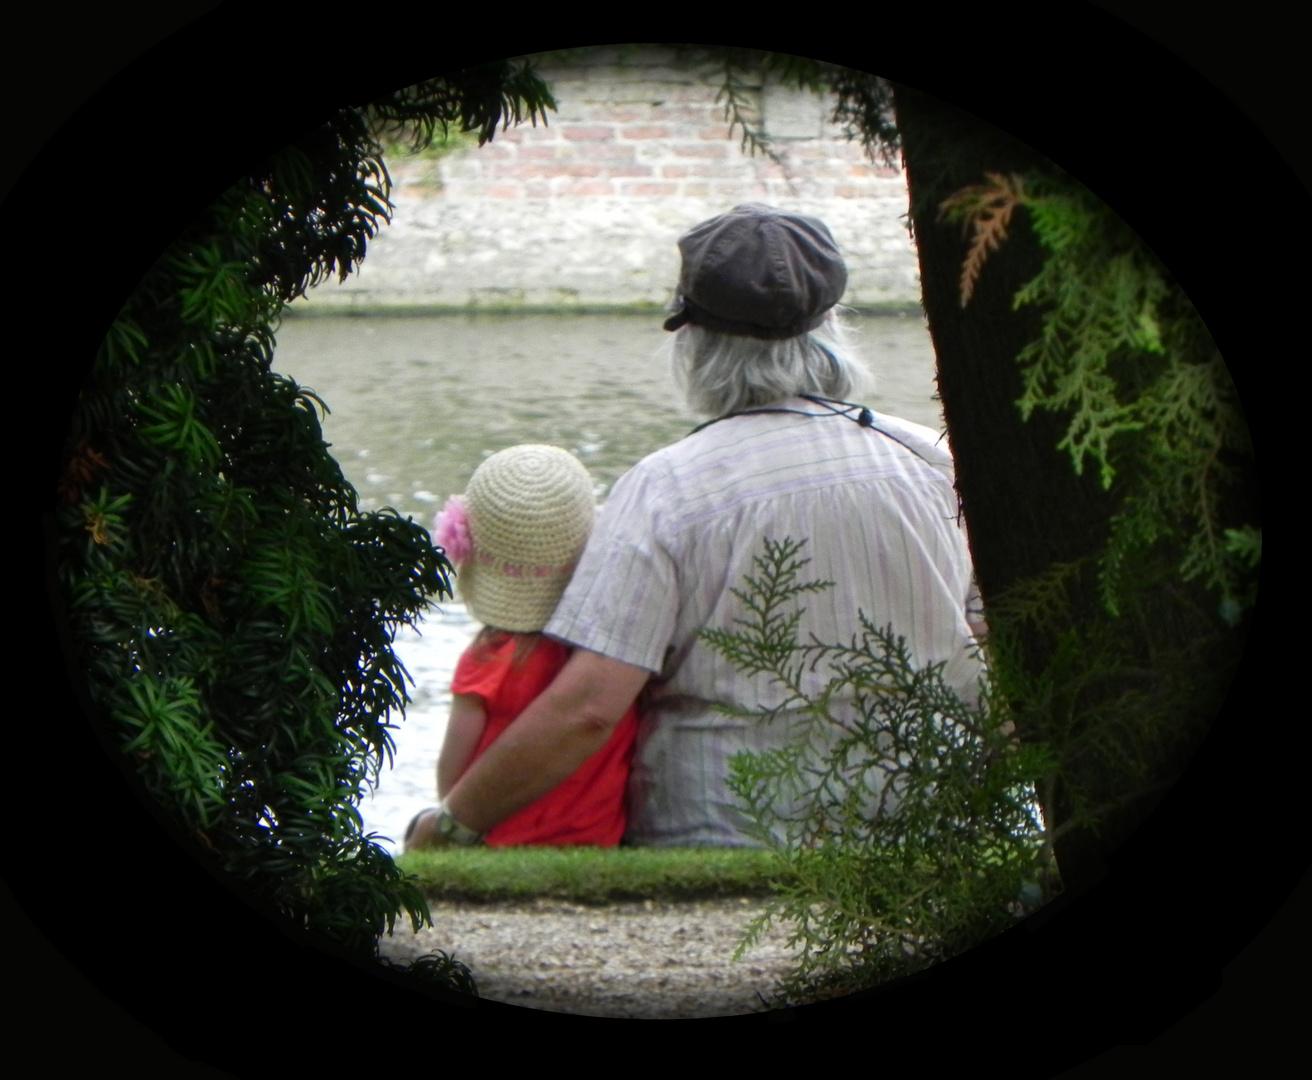 Grand-mère anglaise avec sa petite-fille.